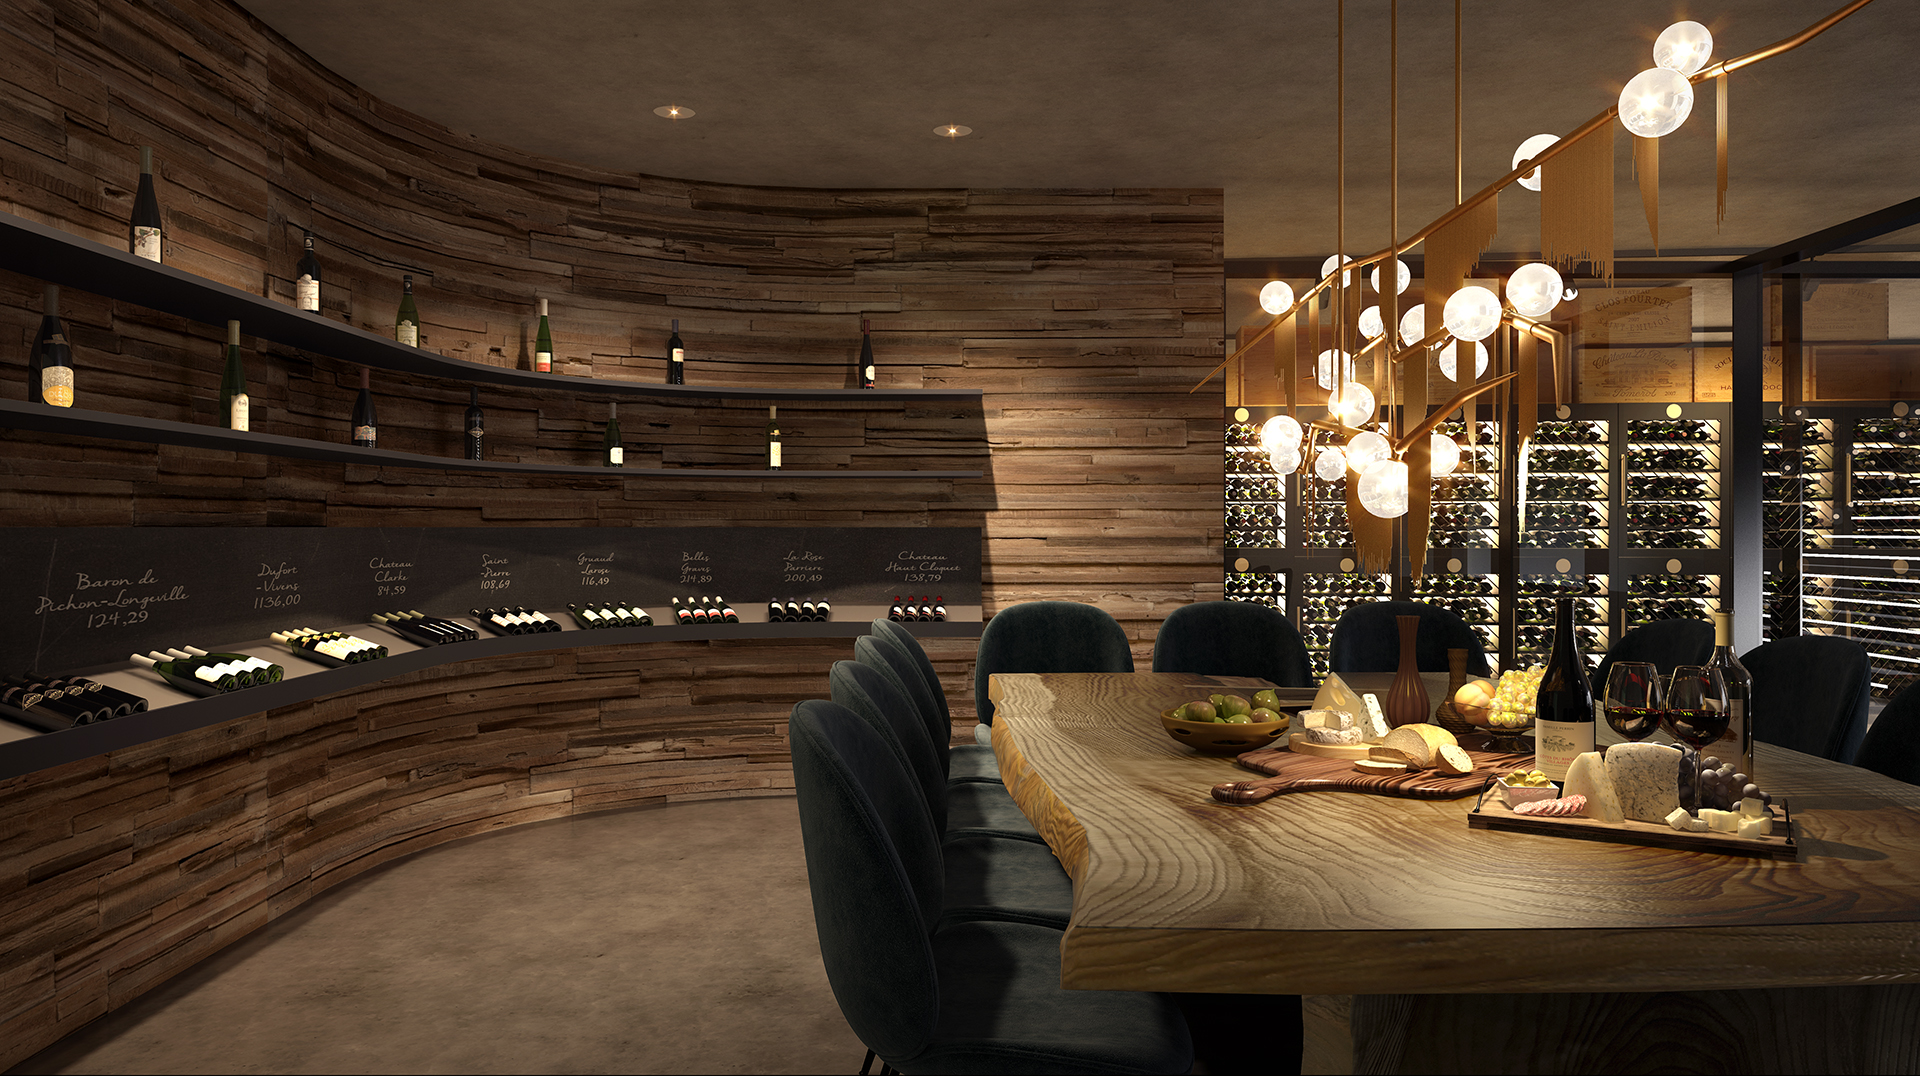 TREN9657_West End Update_IA02_Wine Cellar_Private Dining.jpg